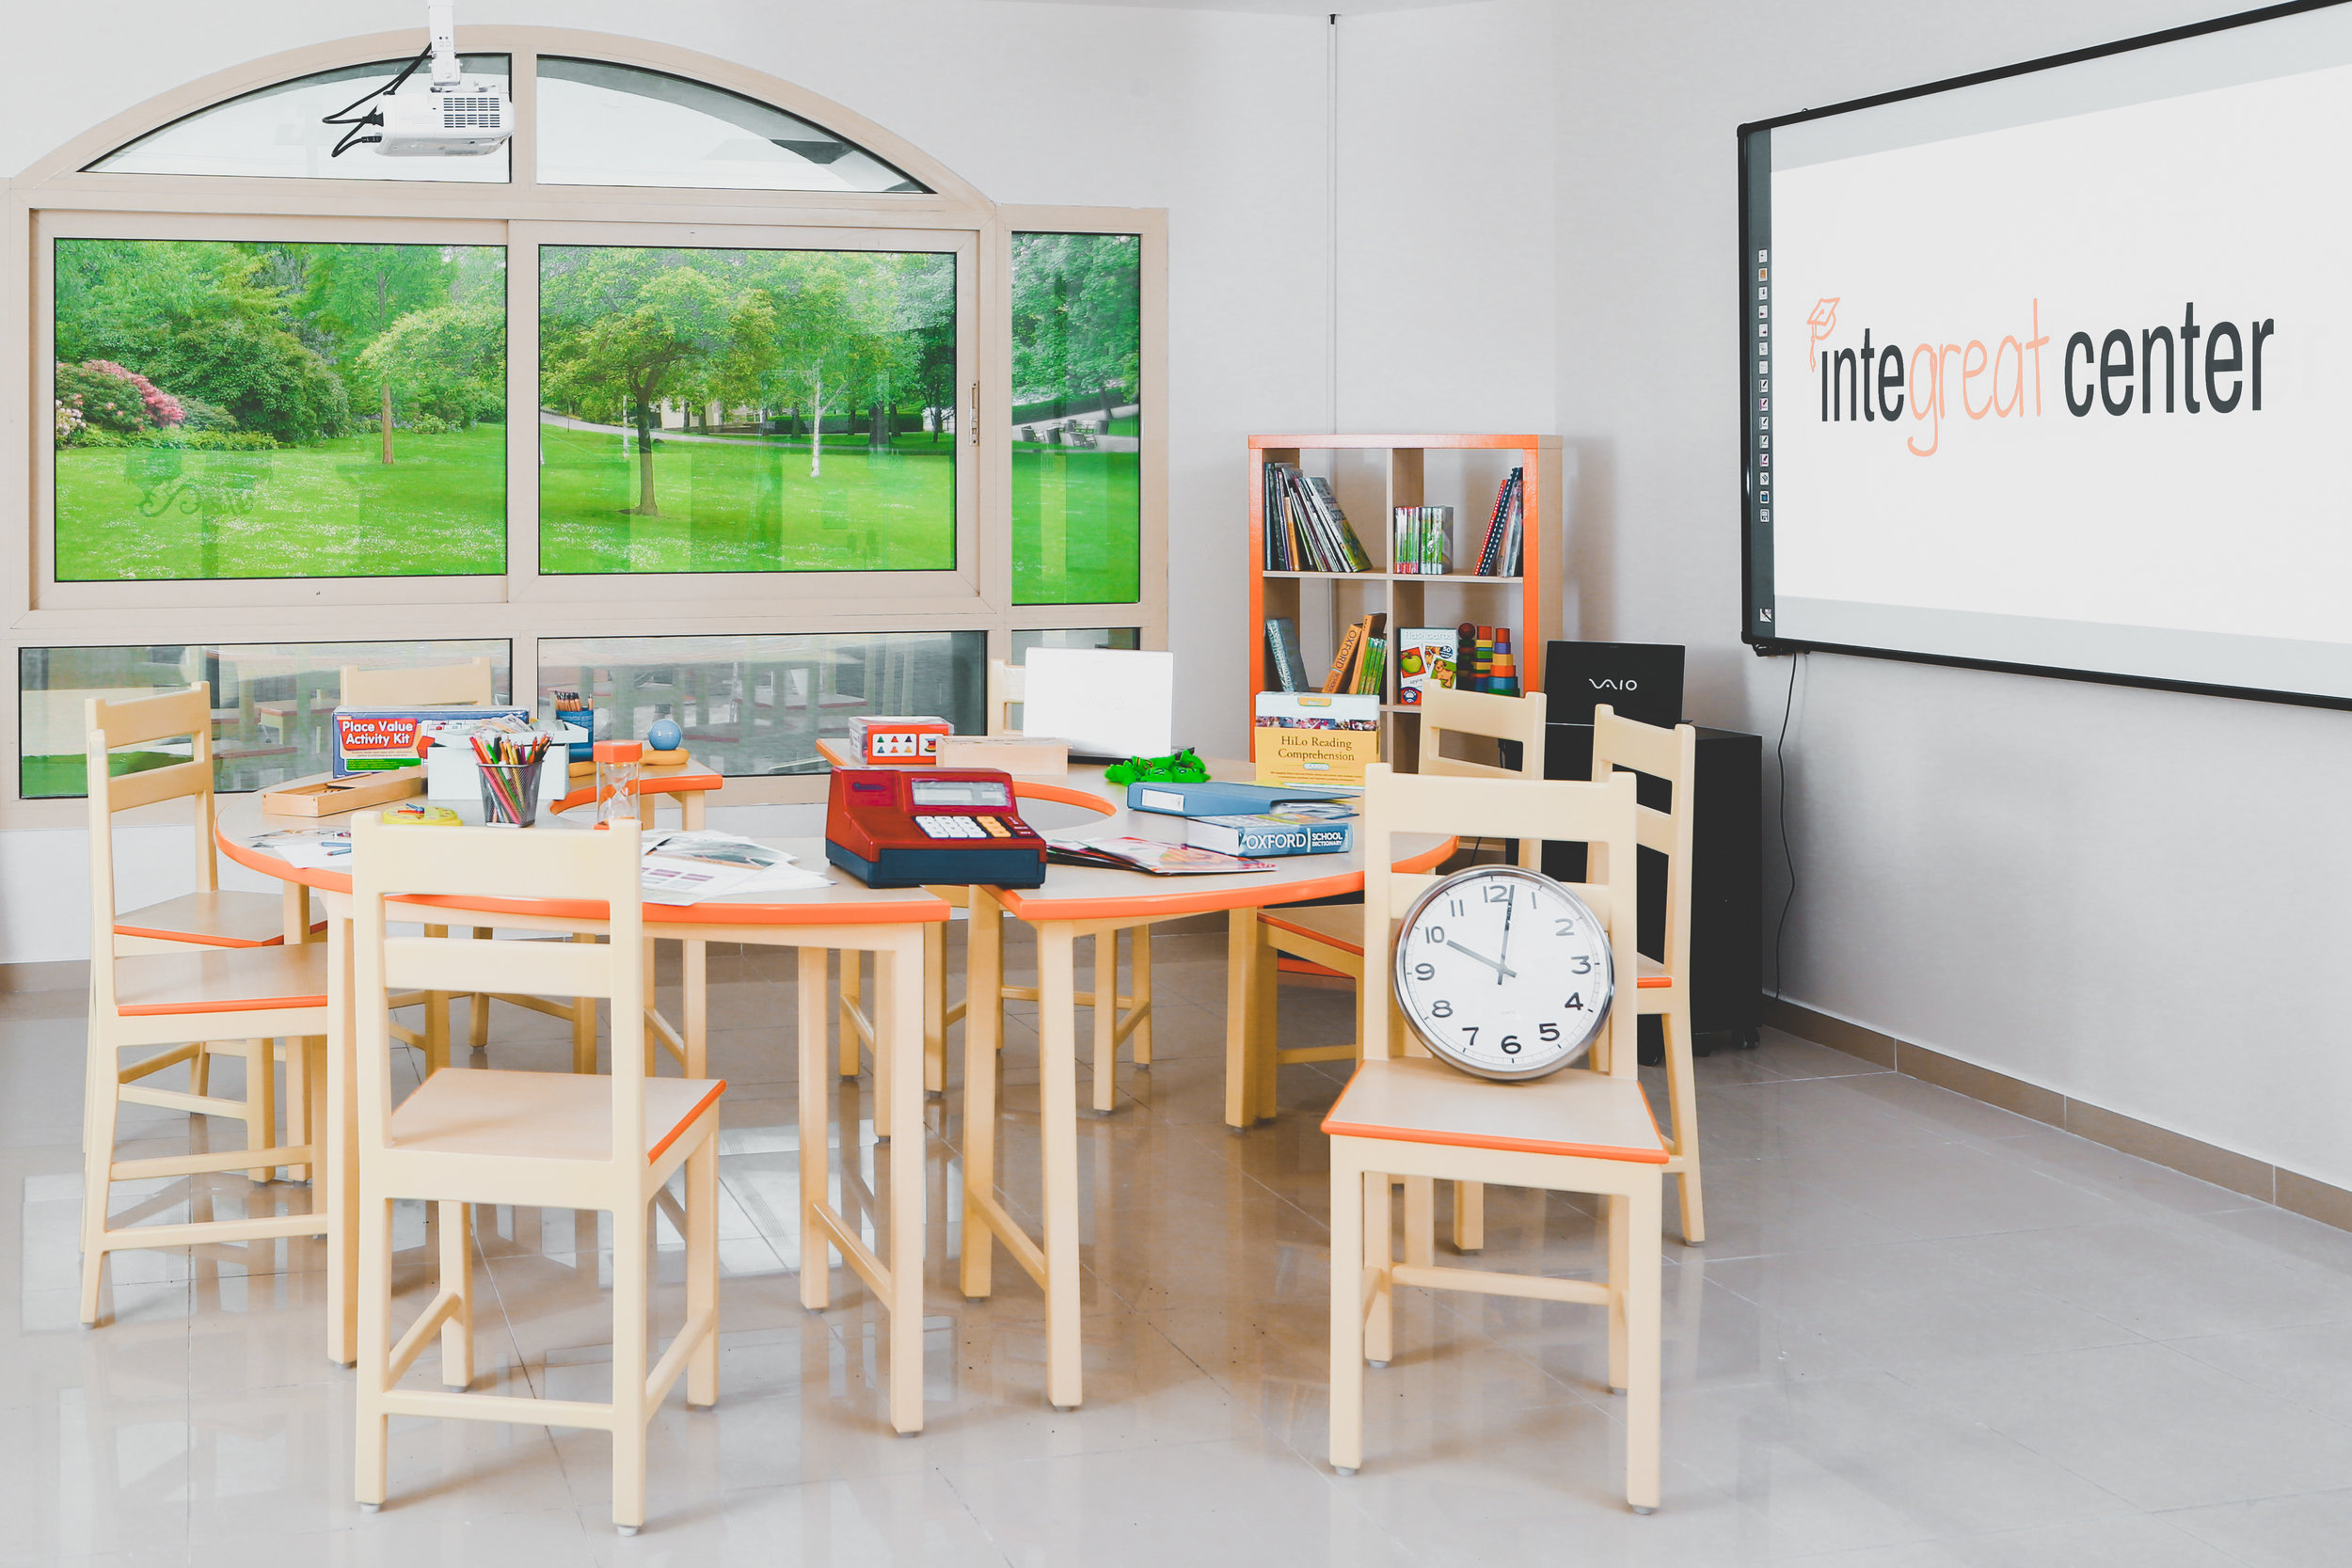 Integreat Center Classrooms